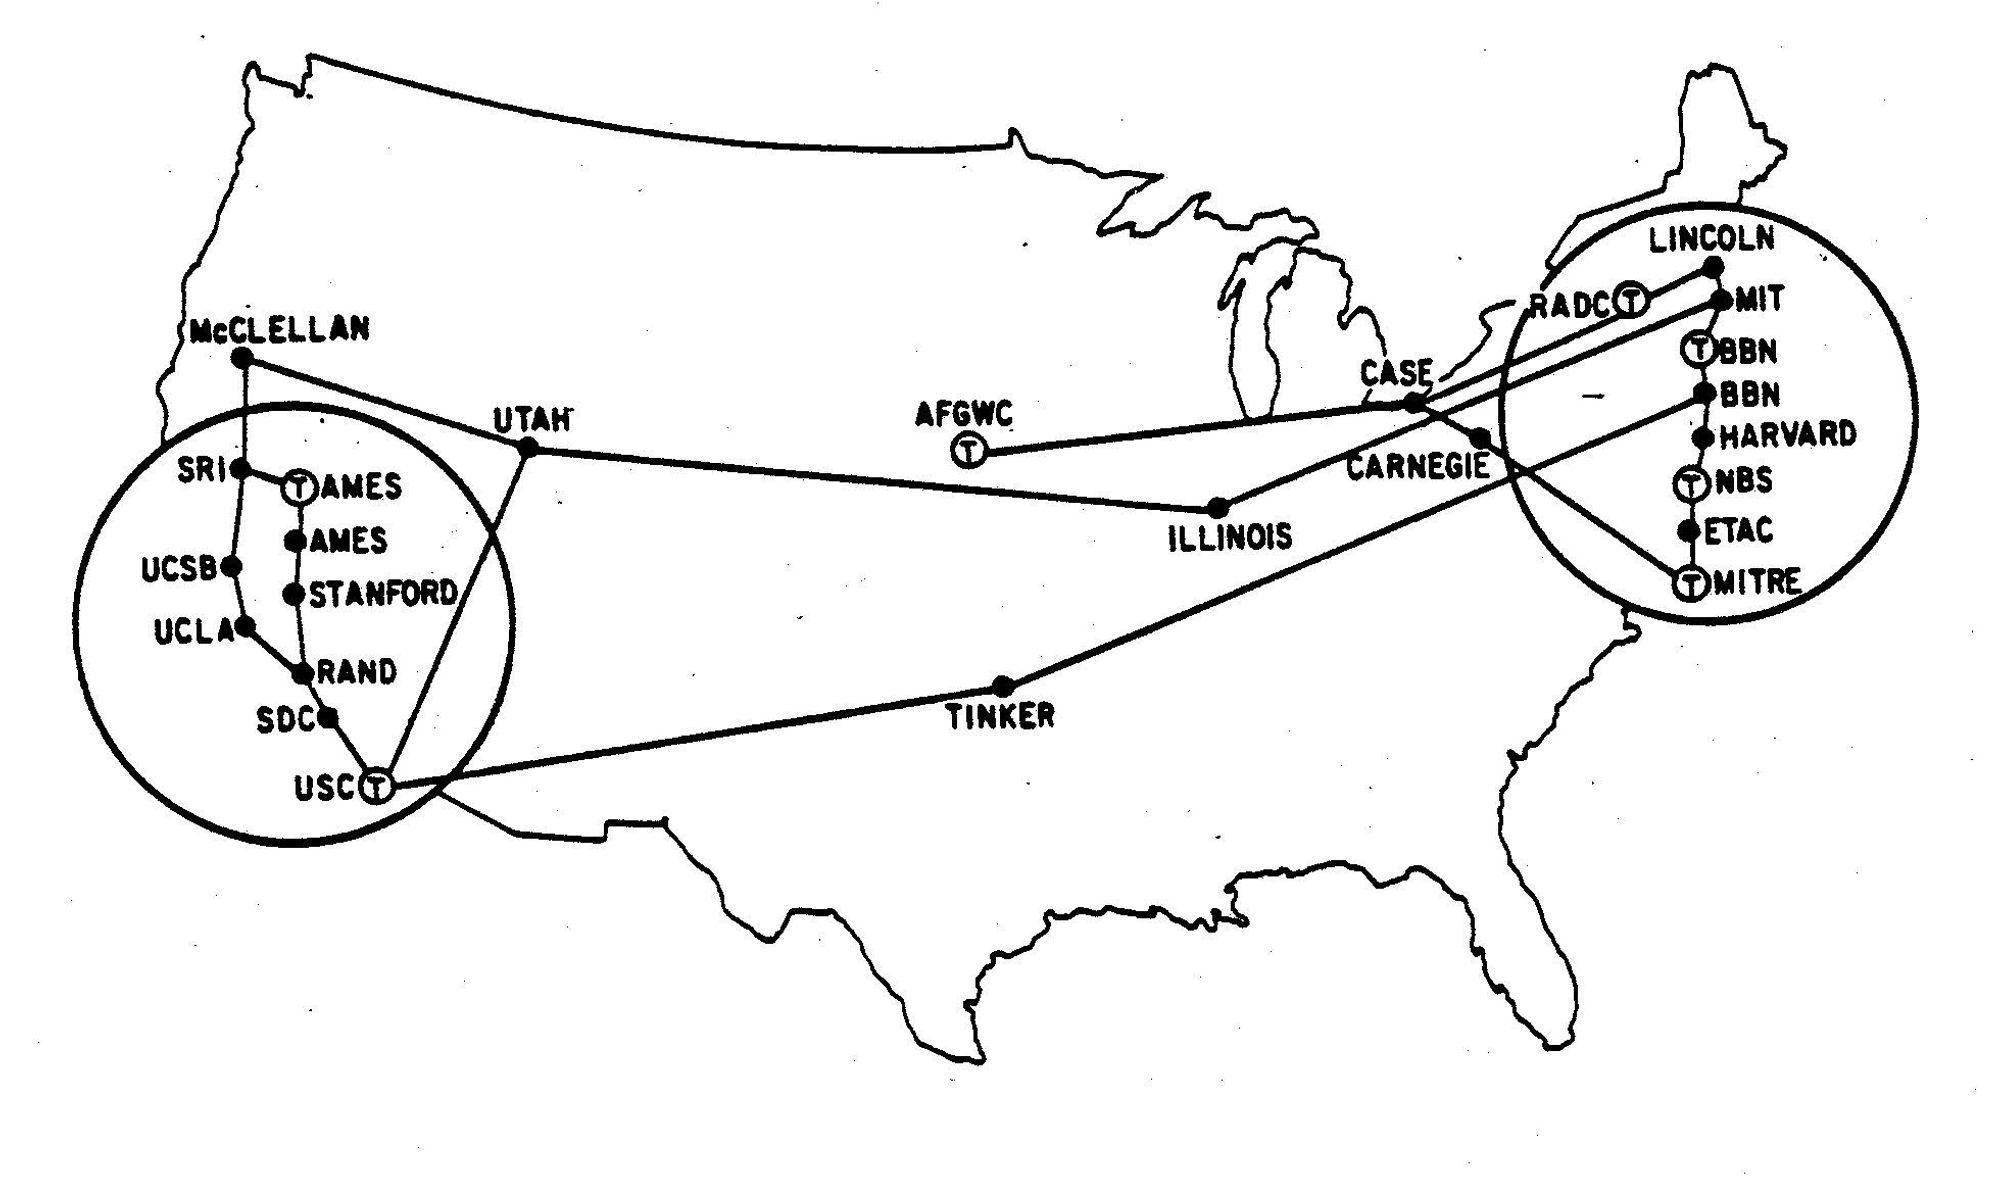 ARPANET i mars 1972.